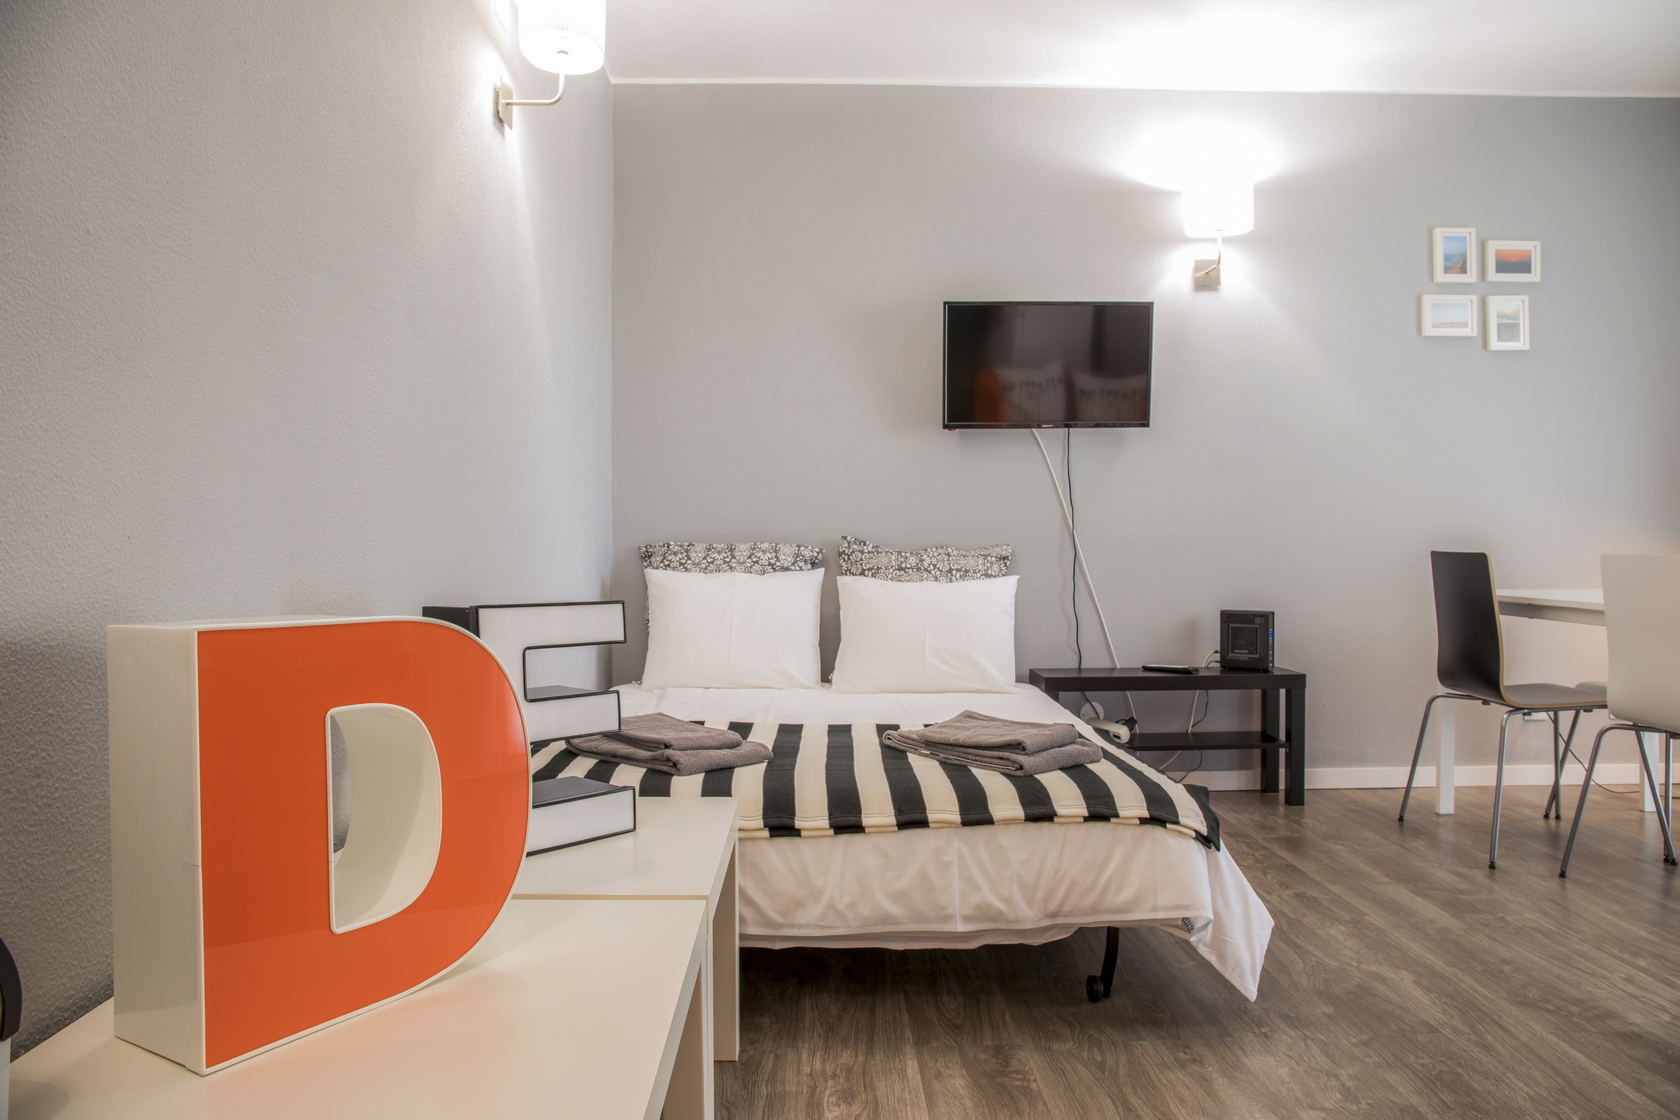 deflat-livingroom-couchbed